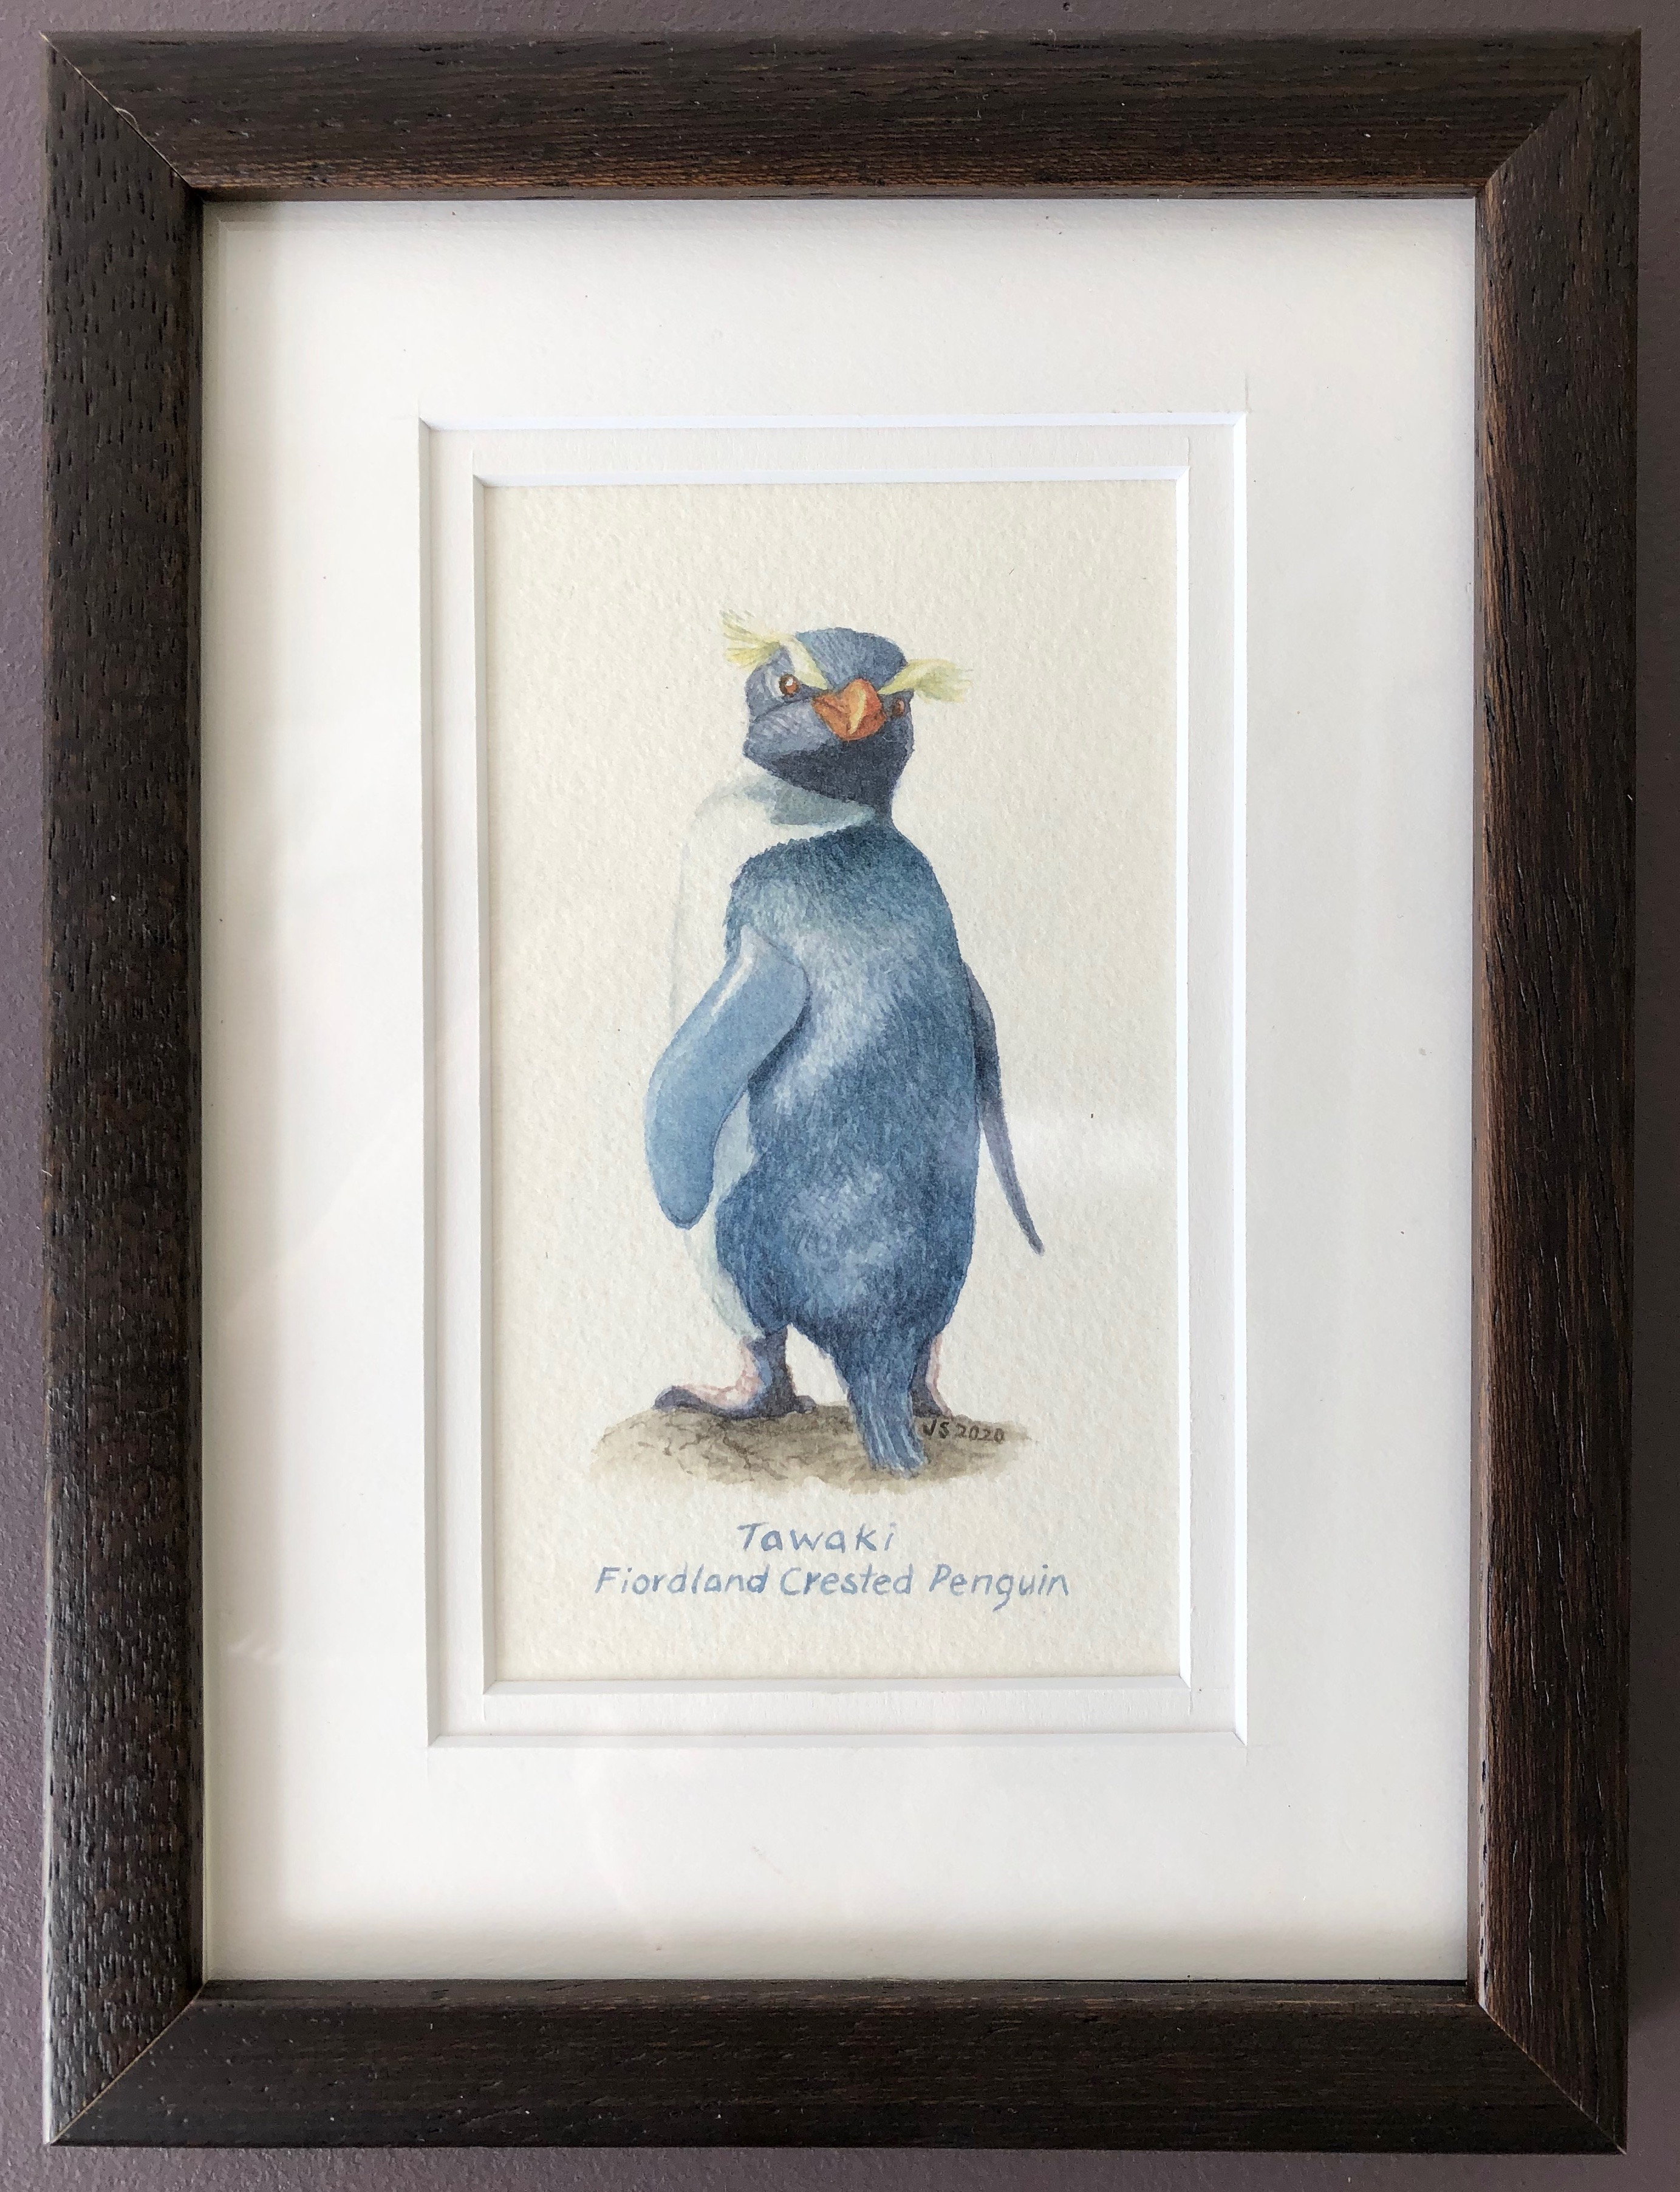 Tawaki Fiordland Crested Penguin